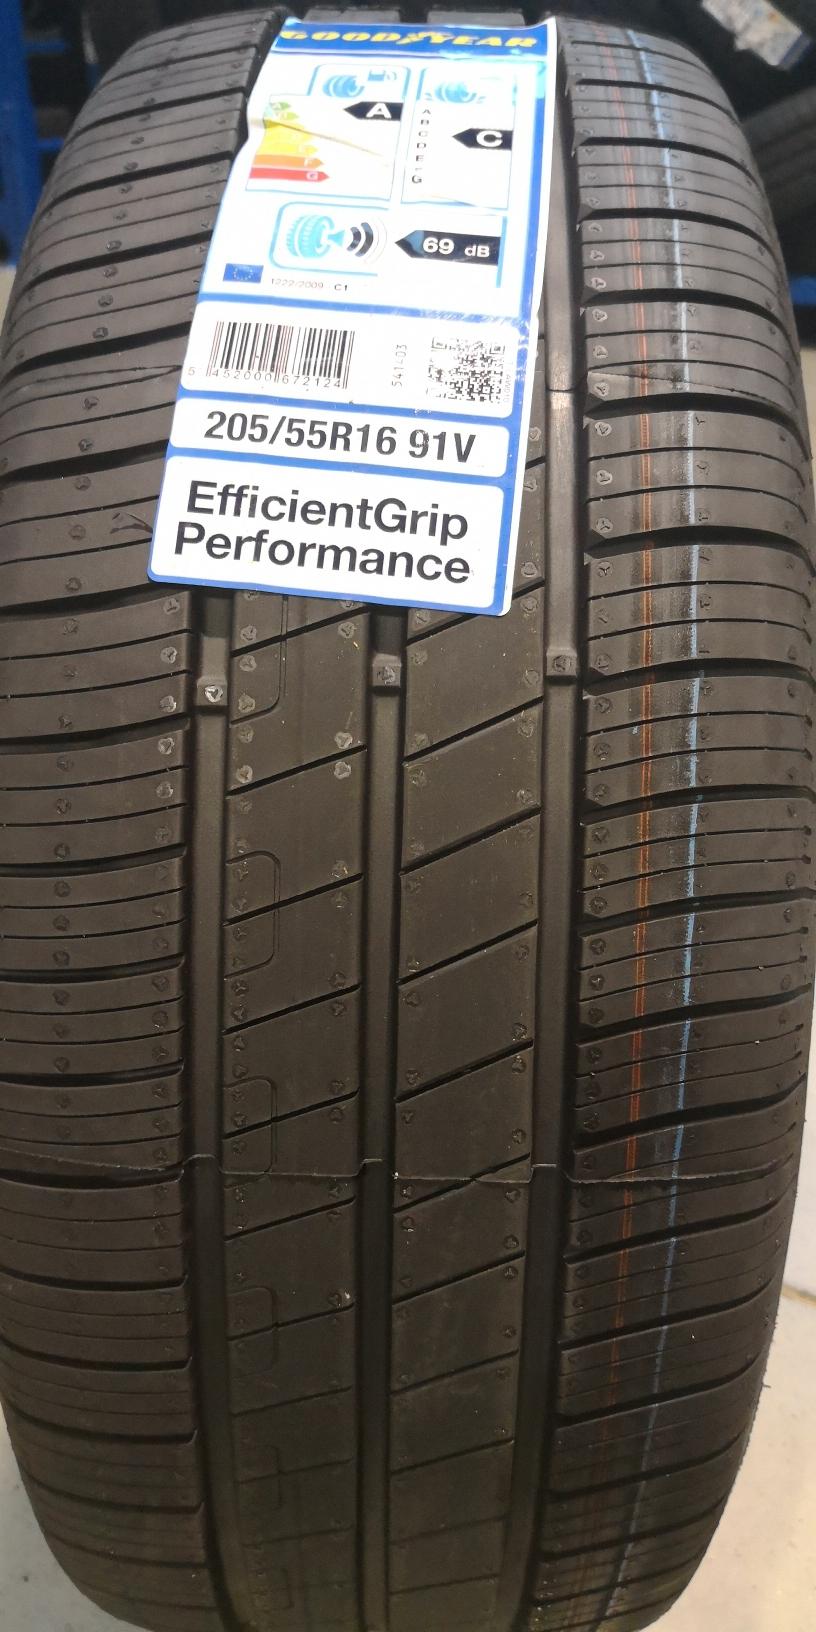 205/55R16 91V, Goodyear, Effigrip Performance